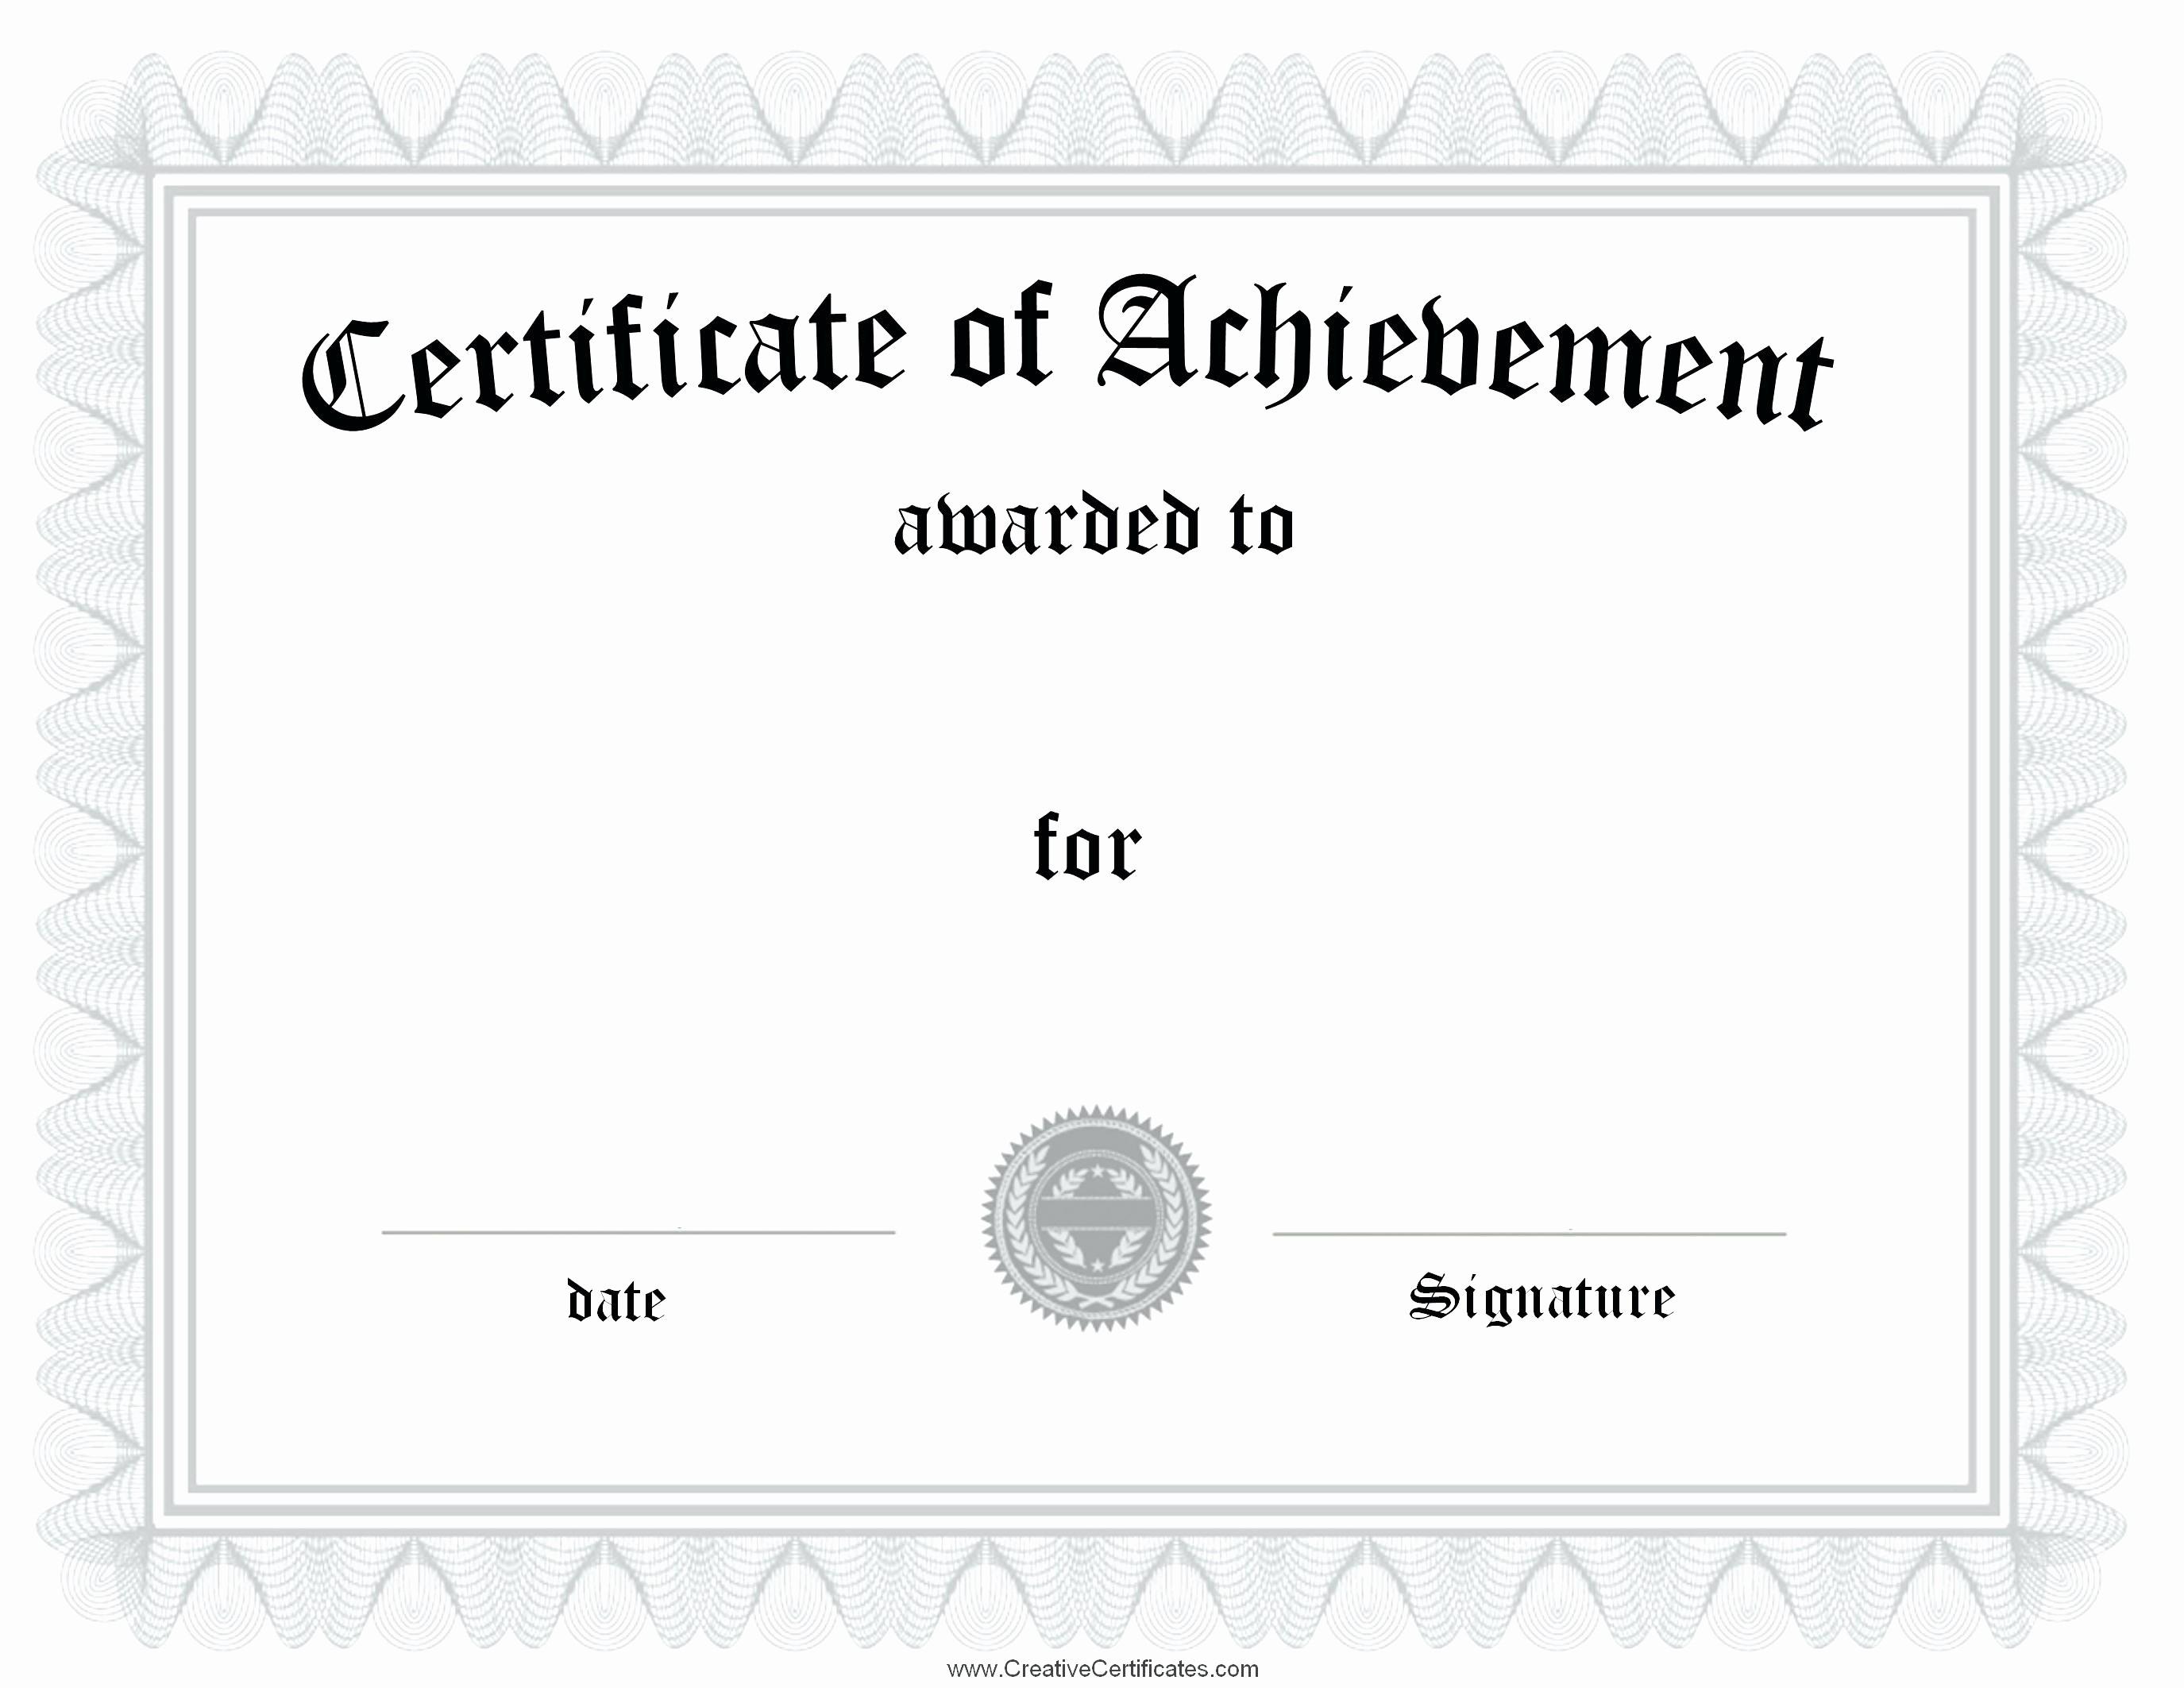 Awards Certificate Template Google Docs Luxury 18 Certificate Templates Google Docs